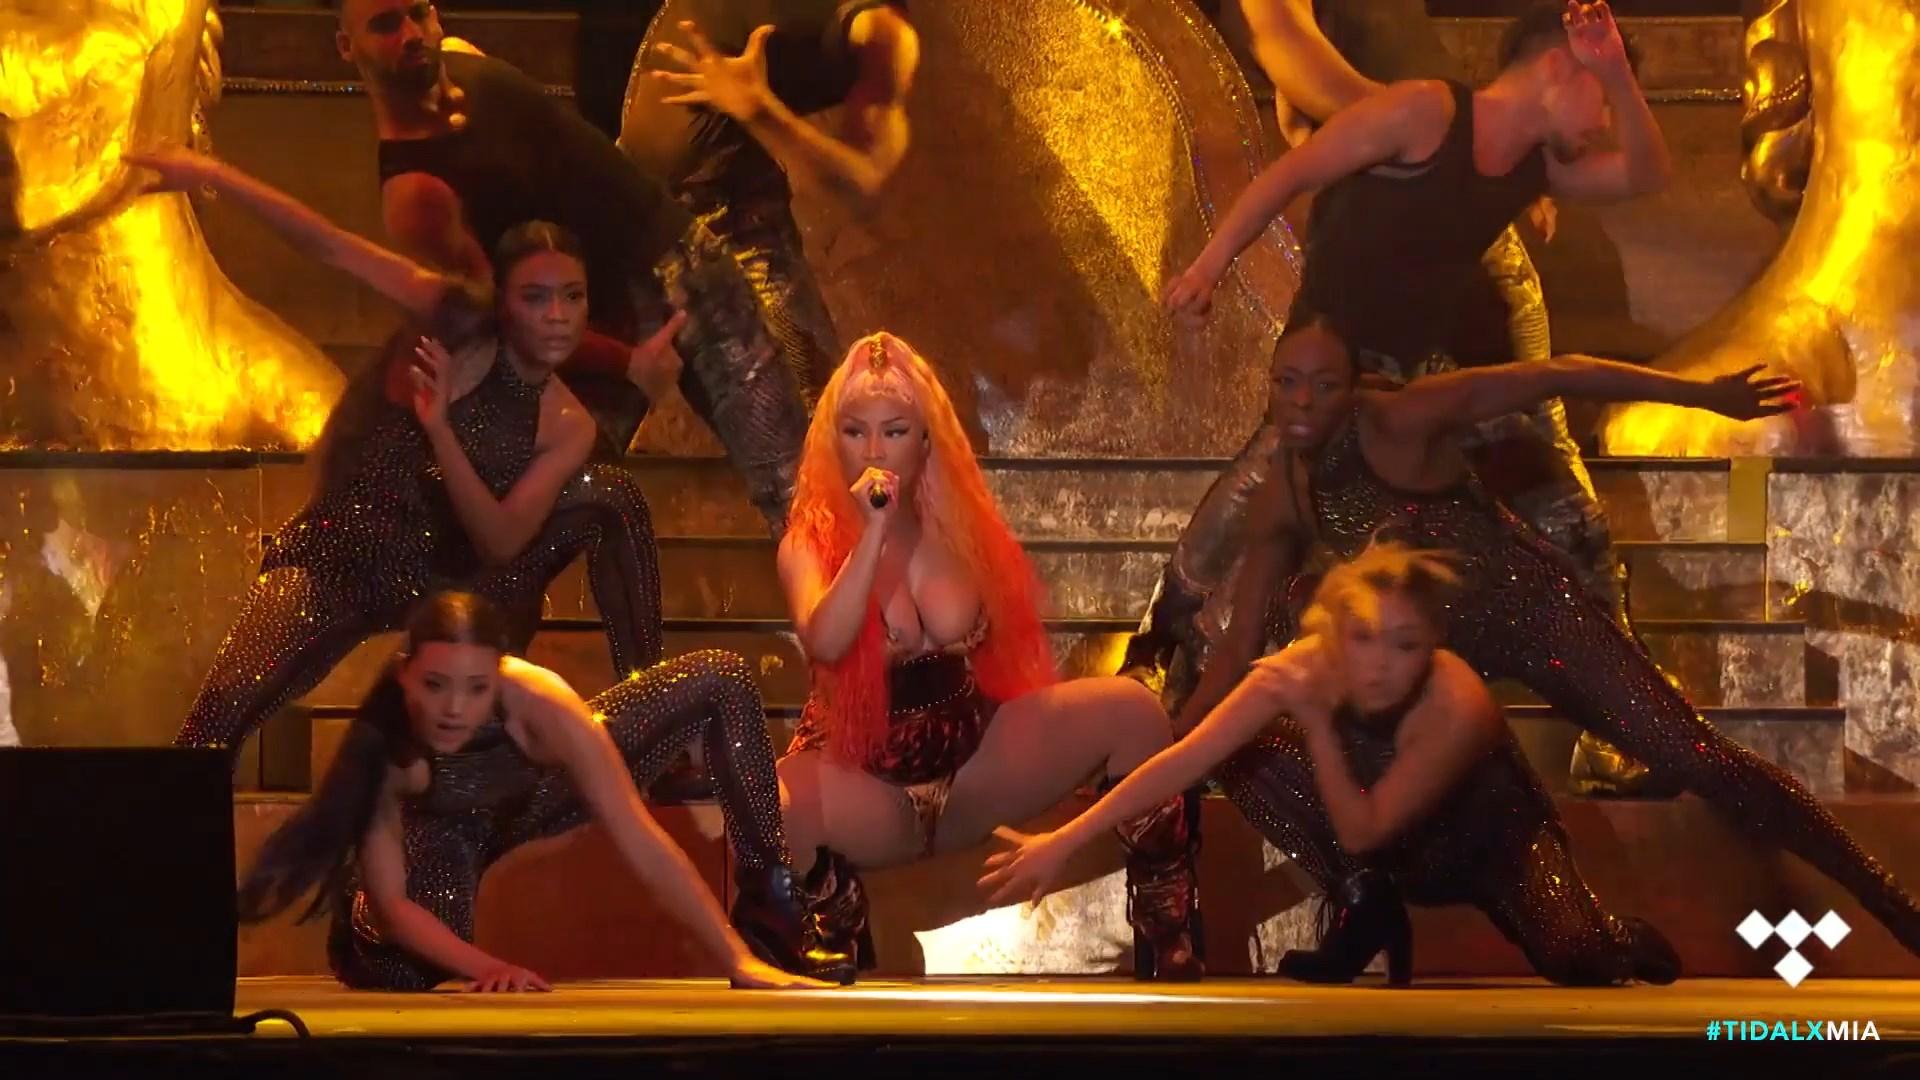 Nicki-Minaj-Nude-TheFappeningBlog.com-8.jpg